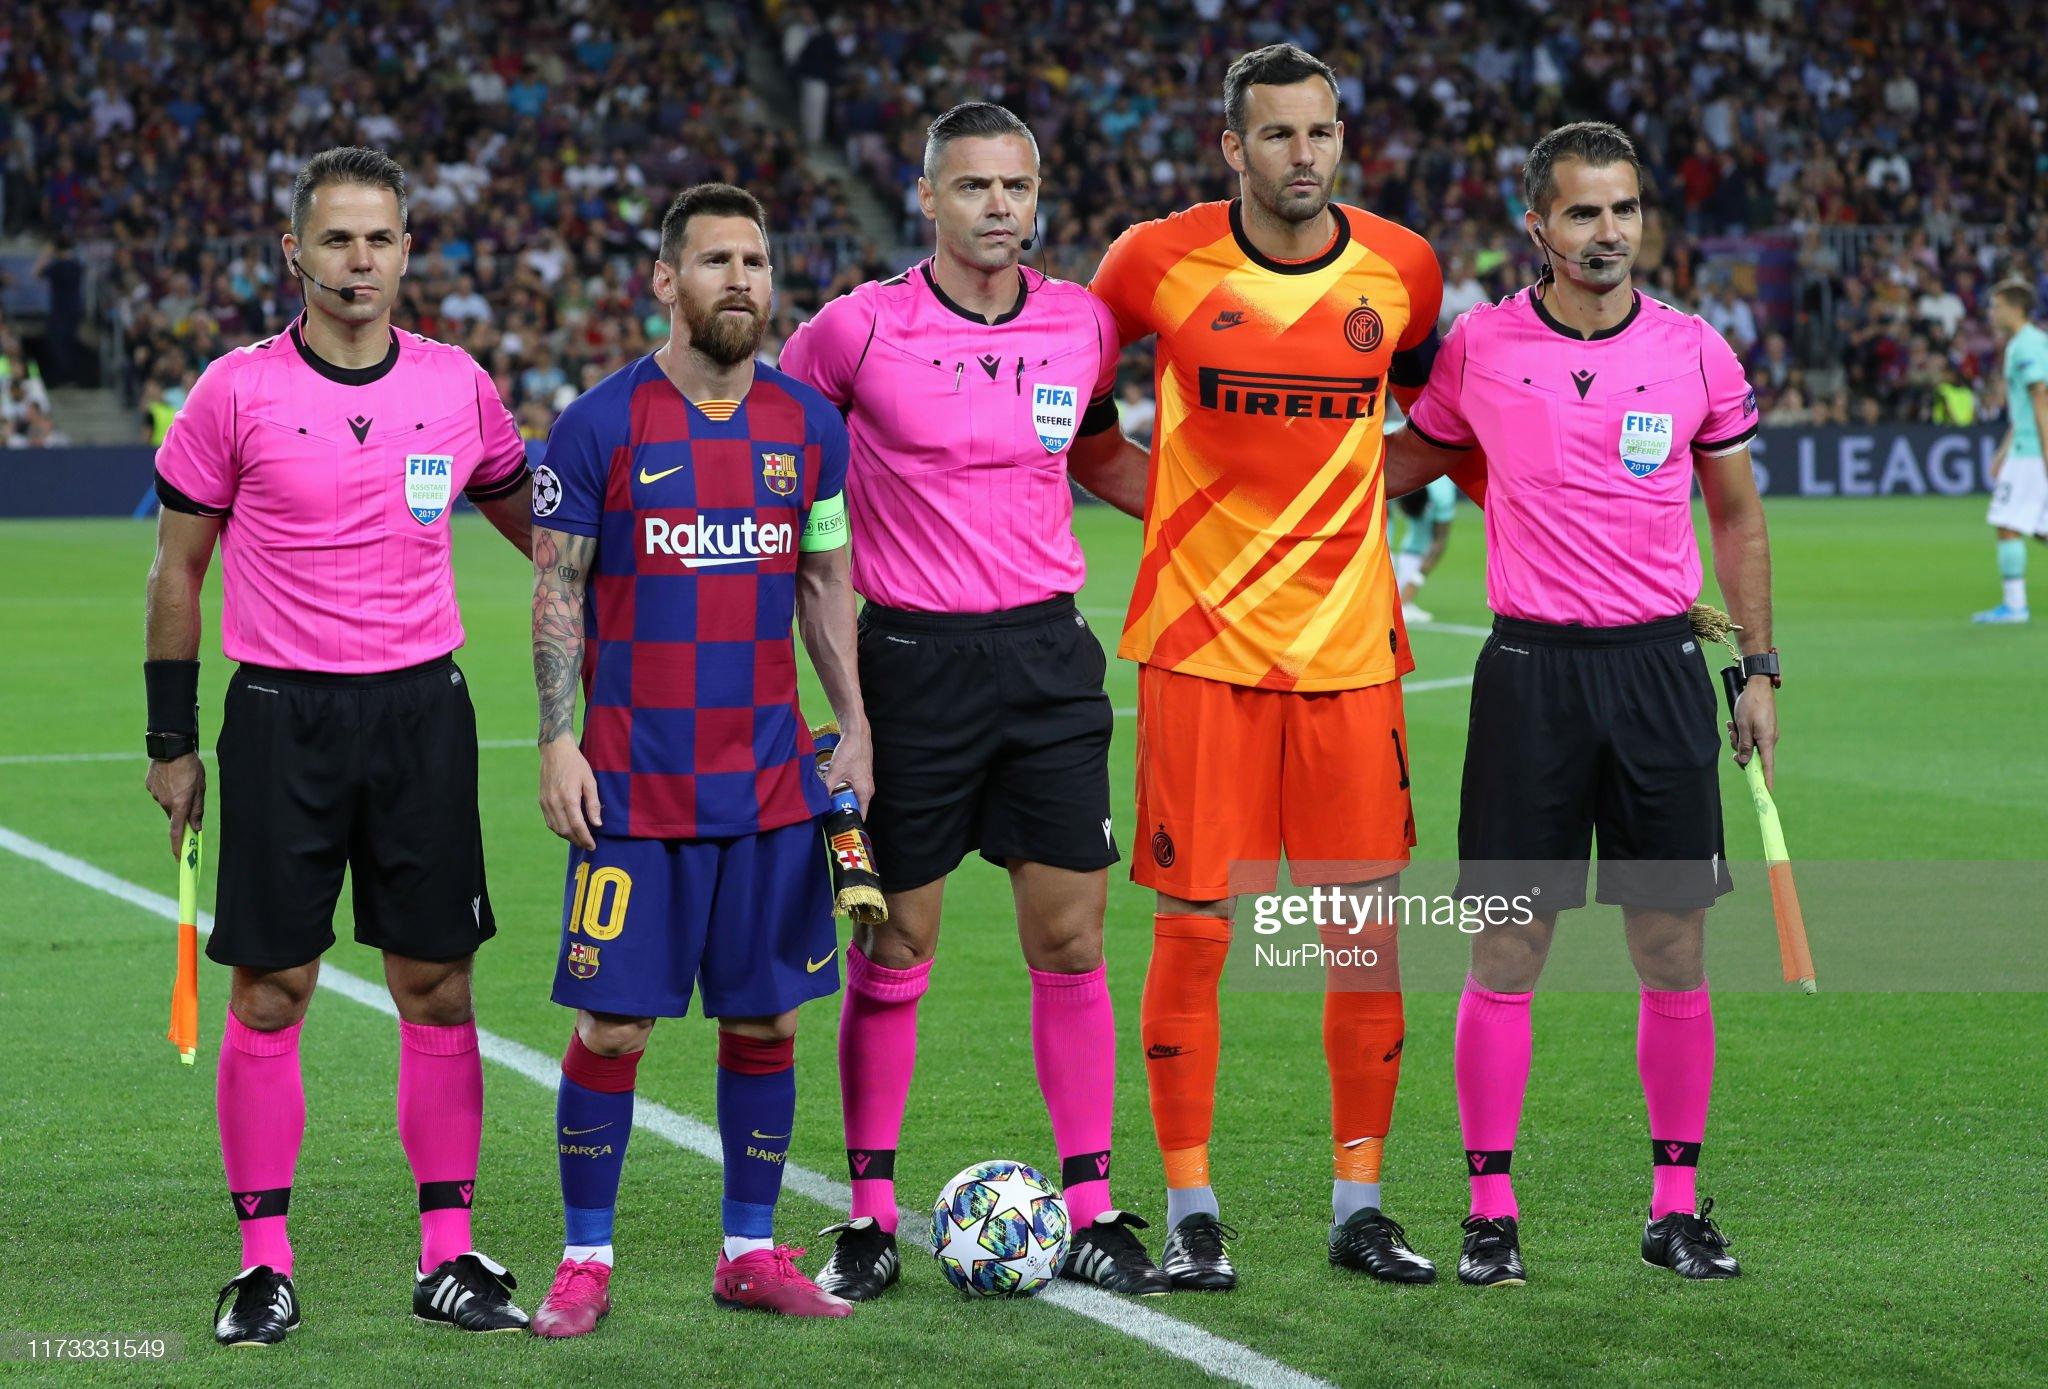 صور مباراة : برشلونة - إنتر 2-1 ( 02-10-2019 )  Samir-handanovic-and-leo-messi-during-the-match-between-fc-barcelona-picture-id1173331549?s=2048x2048